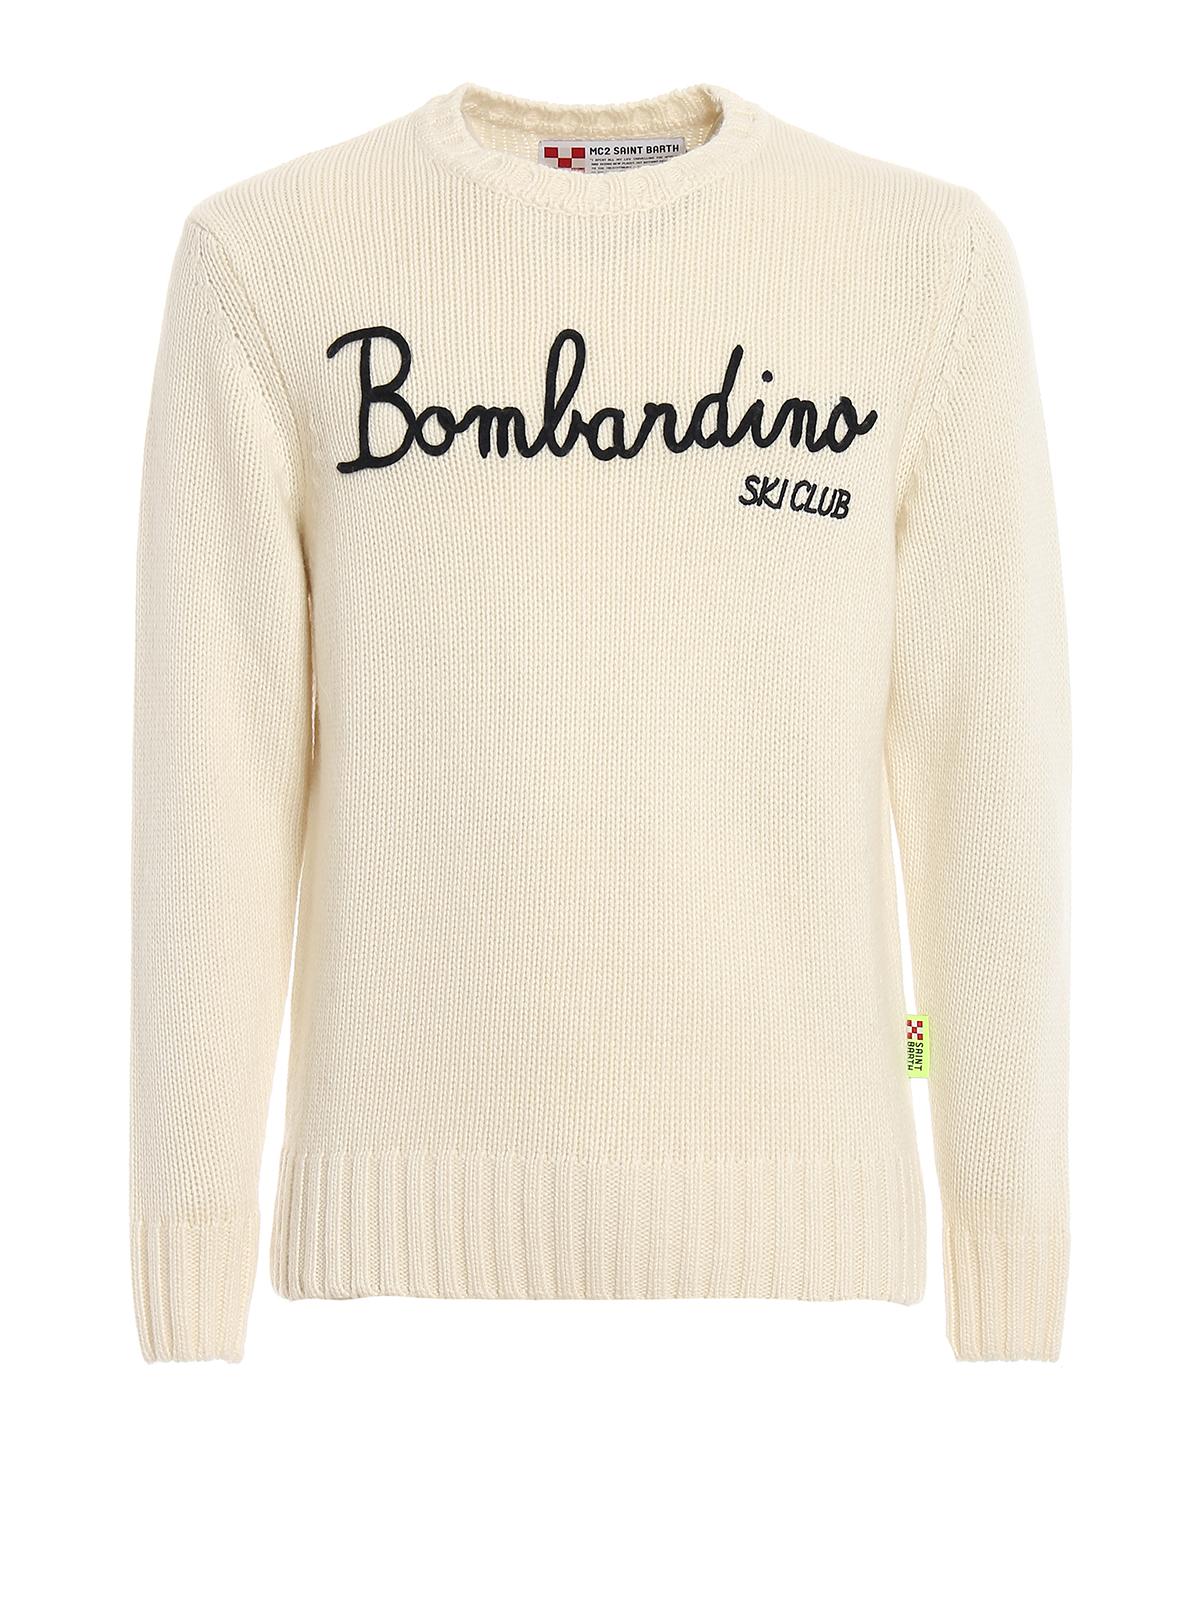 PULLOVER BOMBARDINO SKI CLUB BIANCO BOMBARDINOEMSK10 MC2 SAINT BARTH | -1384759495 | BOMBARDINOEMSK10